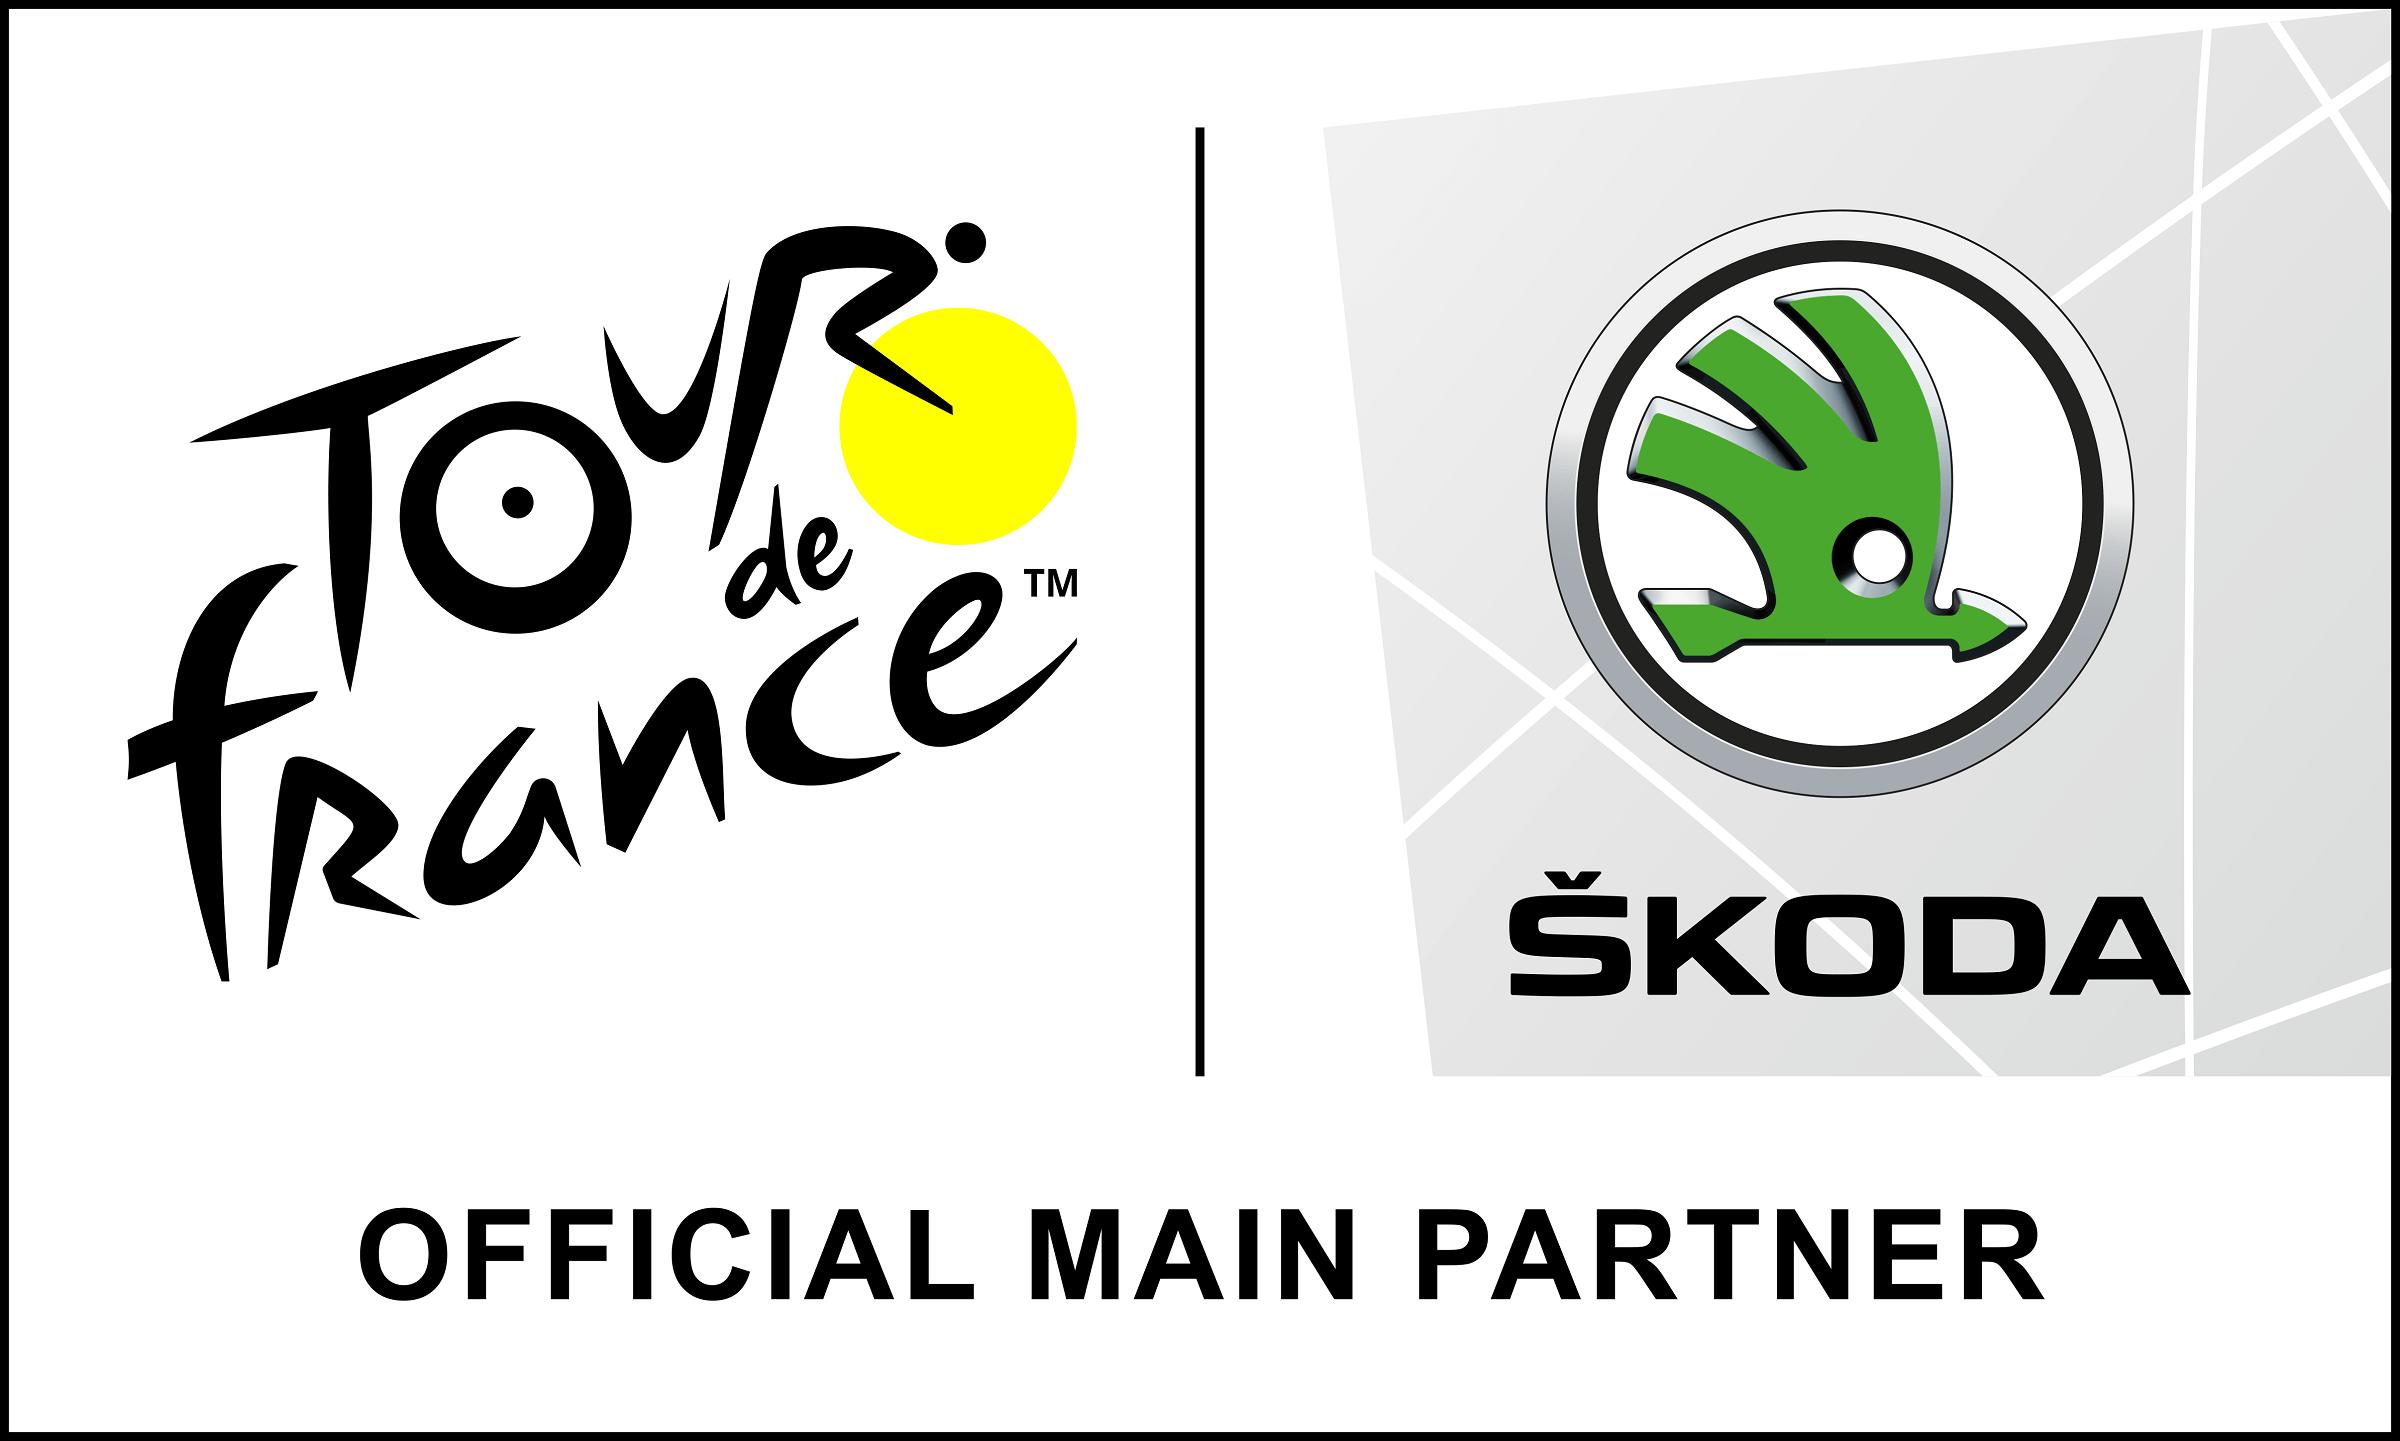 SKODA - Tour de France 2020 Official Main Partner - Logos